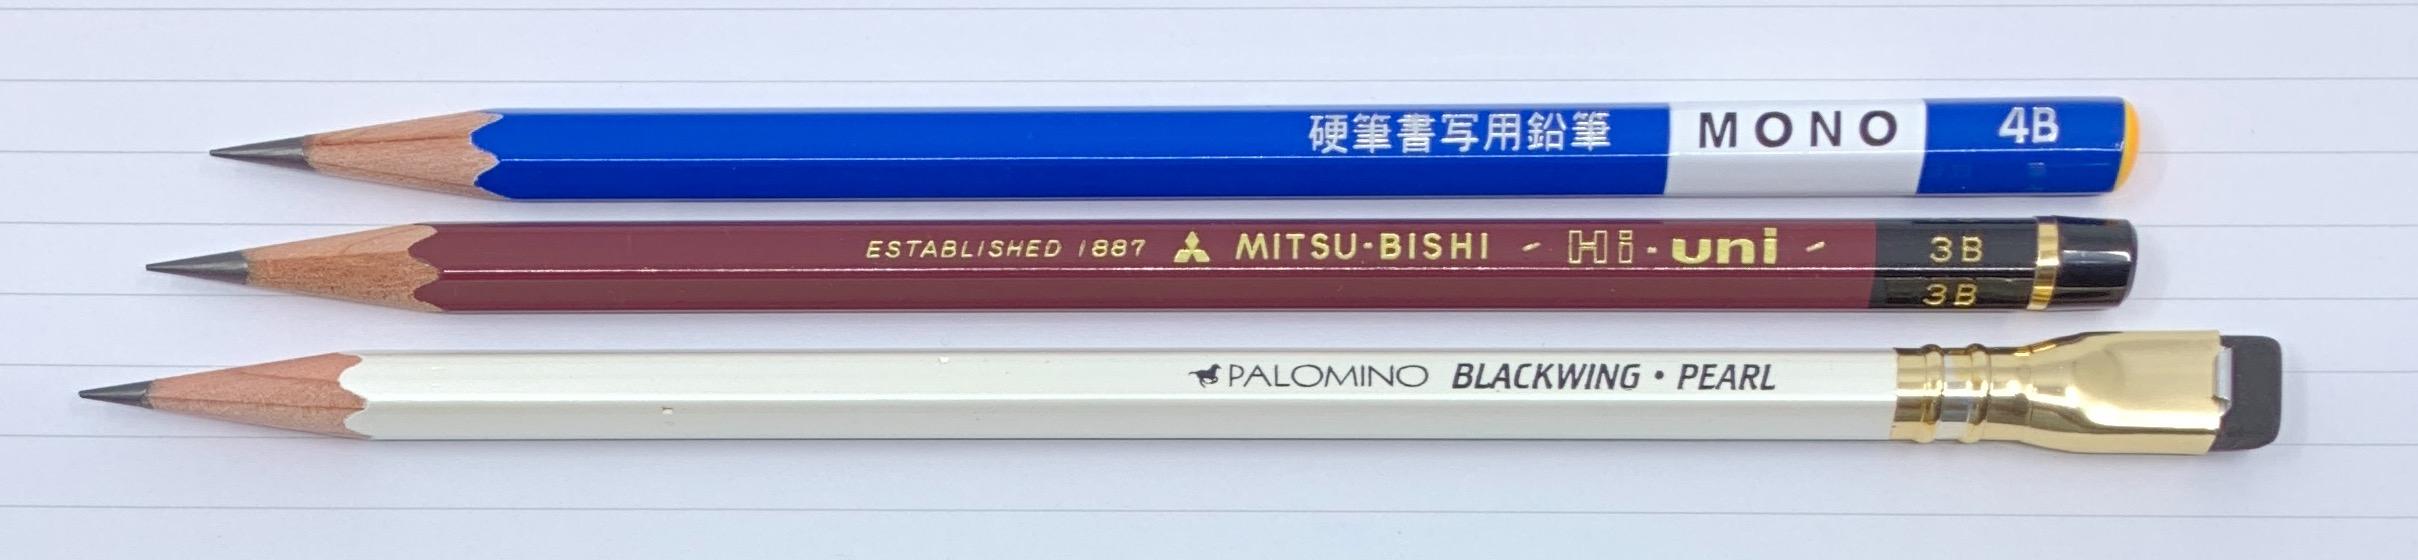 Tombow Mono KM-KKS 4B Pencil Comparison